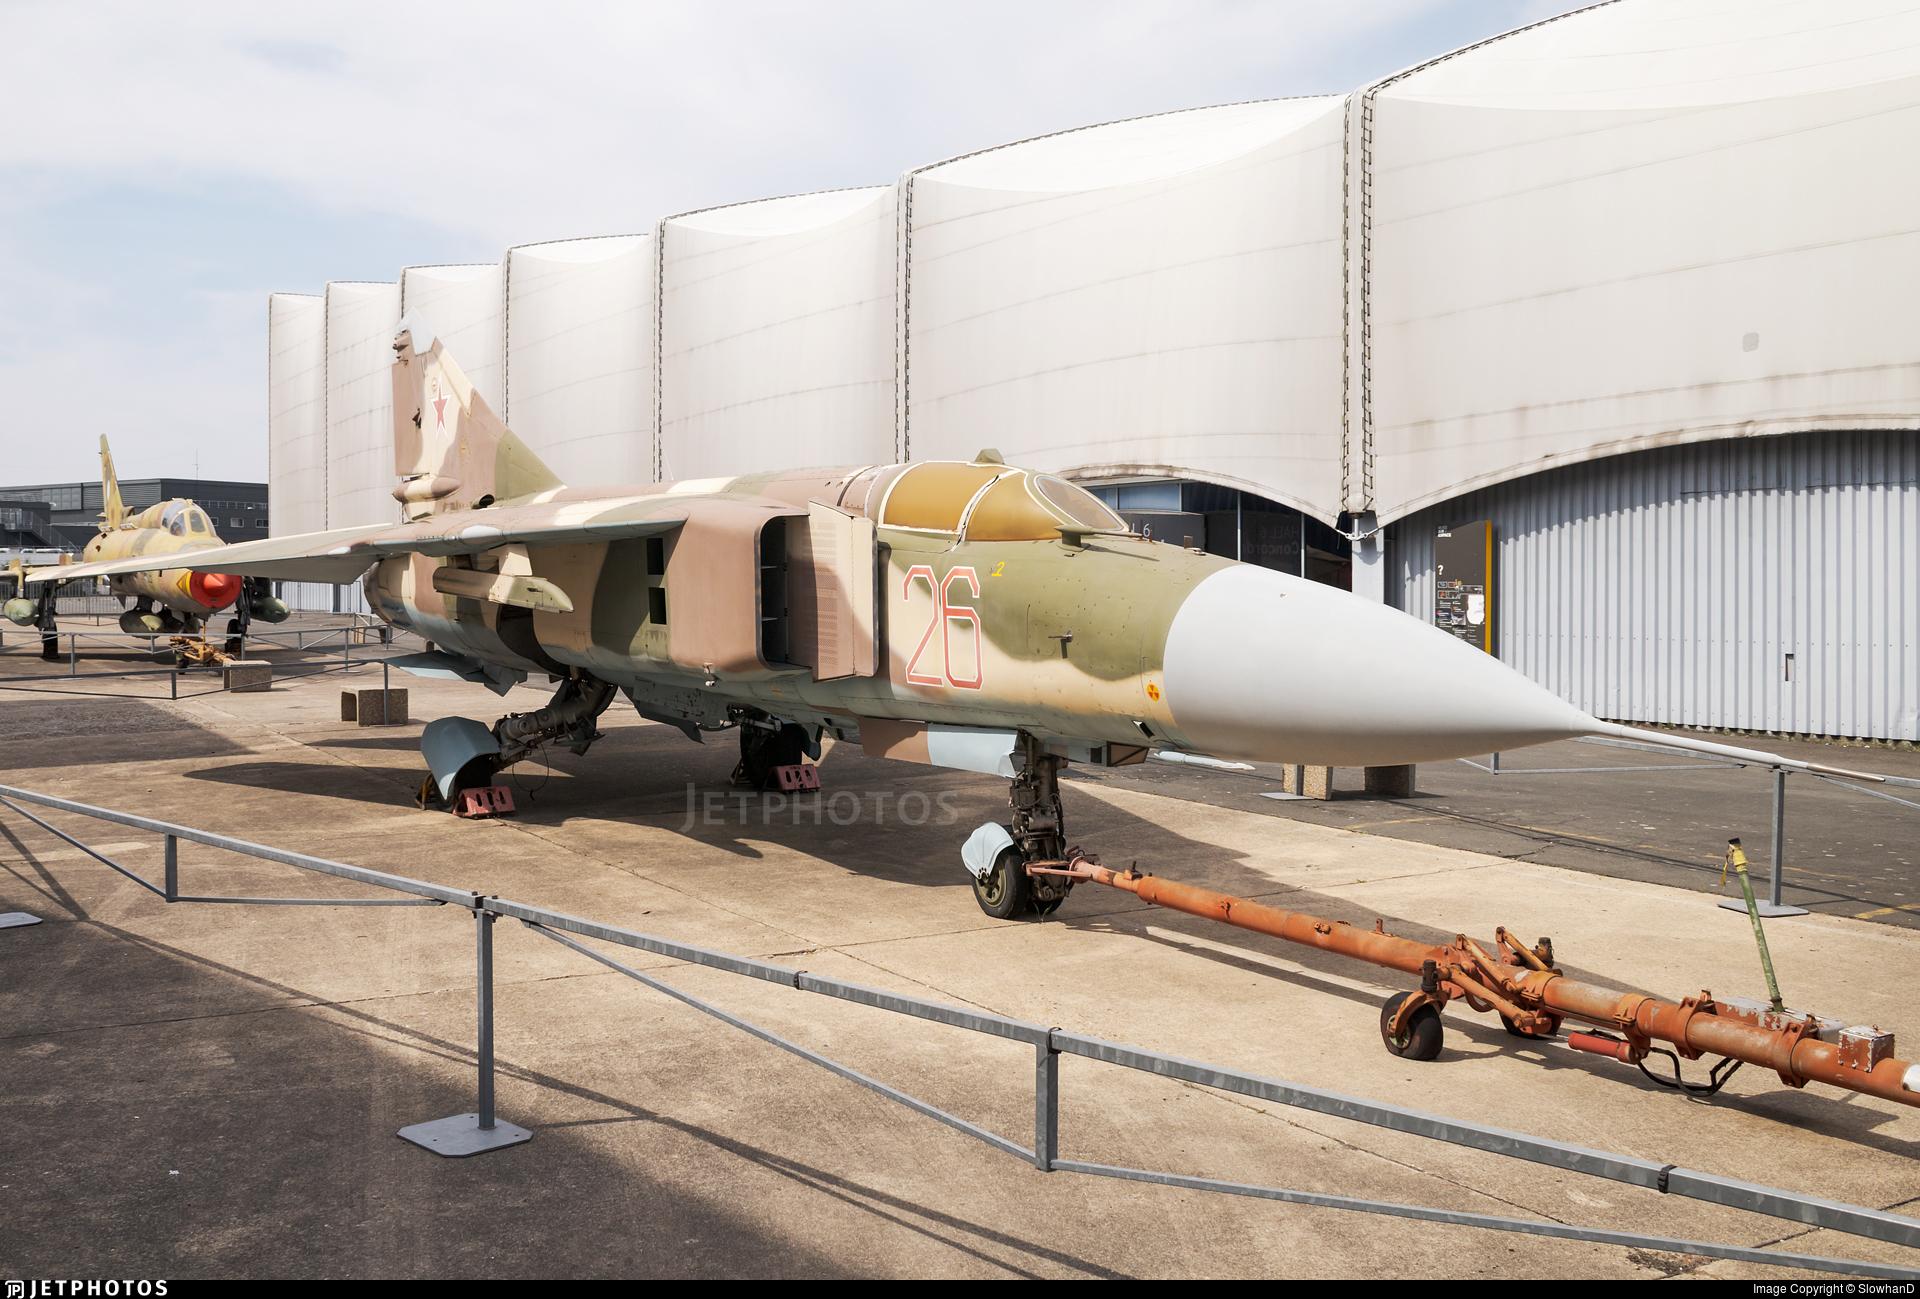 26 - Mikoyan-Gurevich MiG-23ML Flogger G - Russia - Air Force